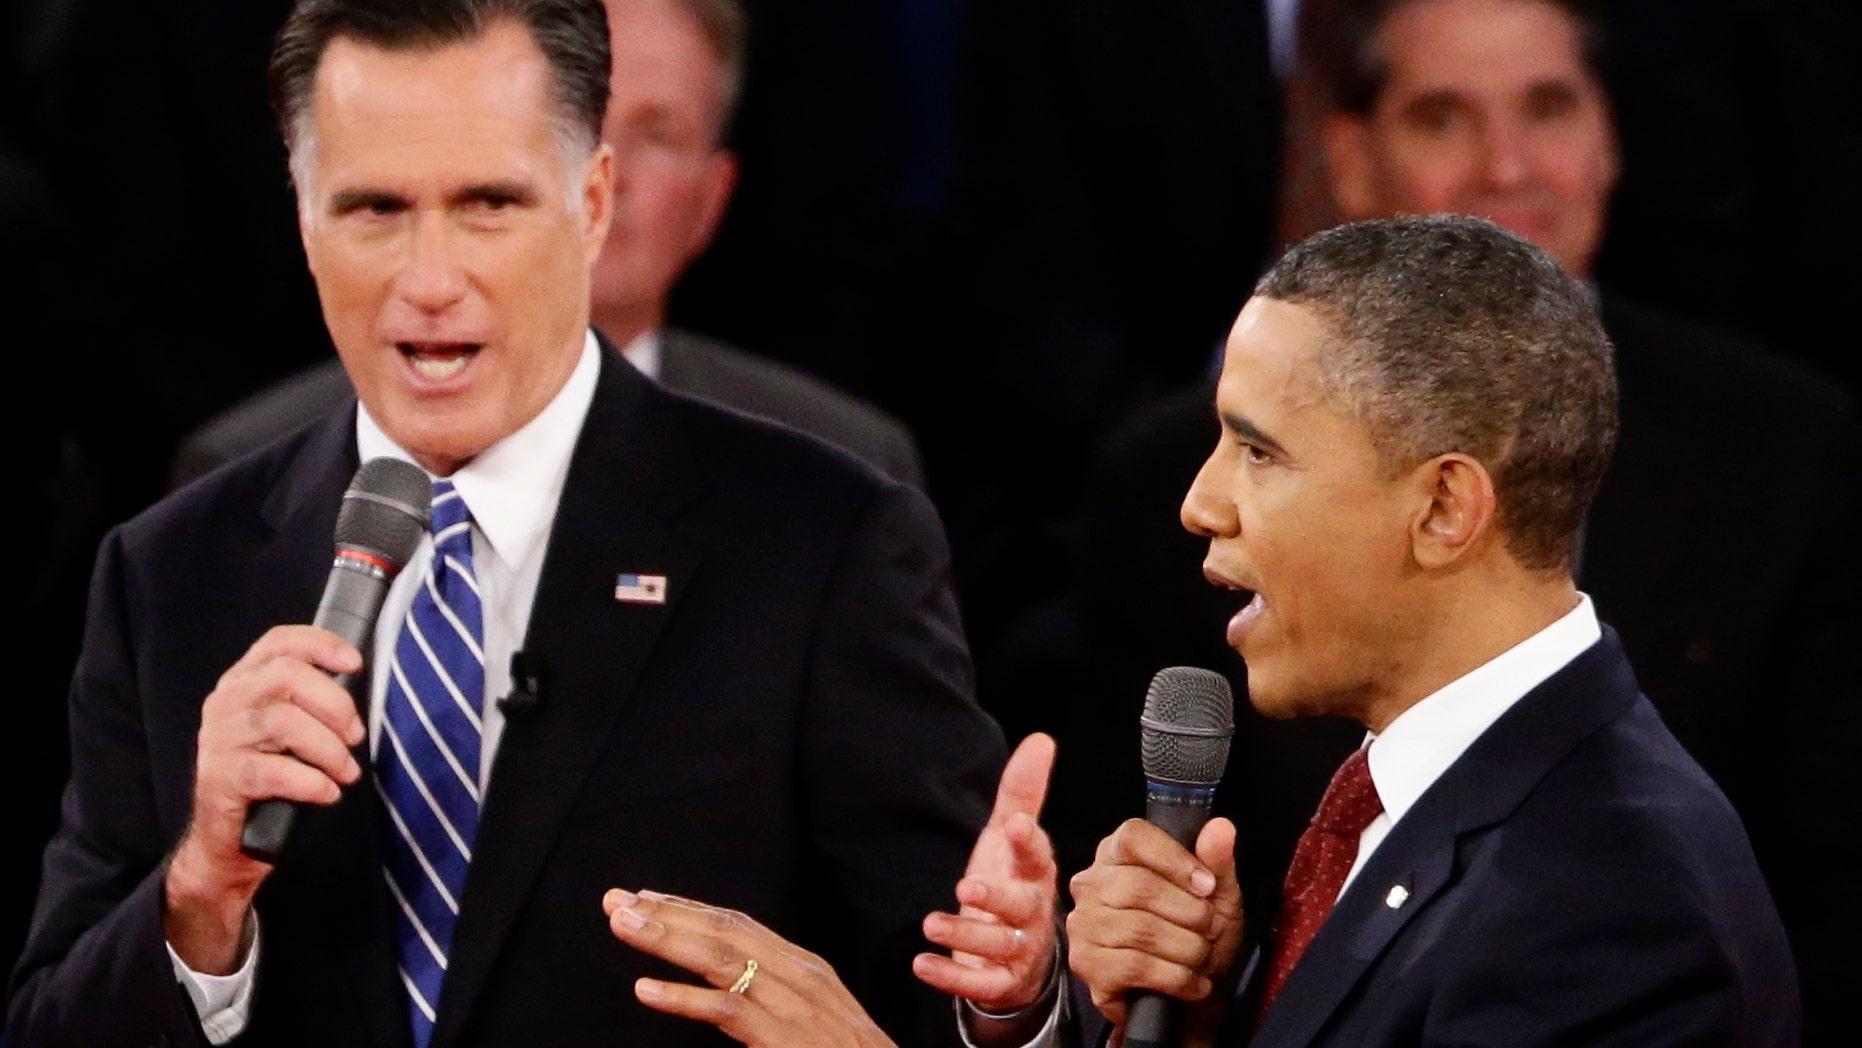 FILE: Oct. 16, 2012.: President Obama and Republican presidential nominee Mitt Romney in the second presidential debate at Hofstra University in Hempstead, N.Y.